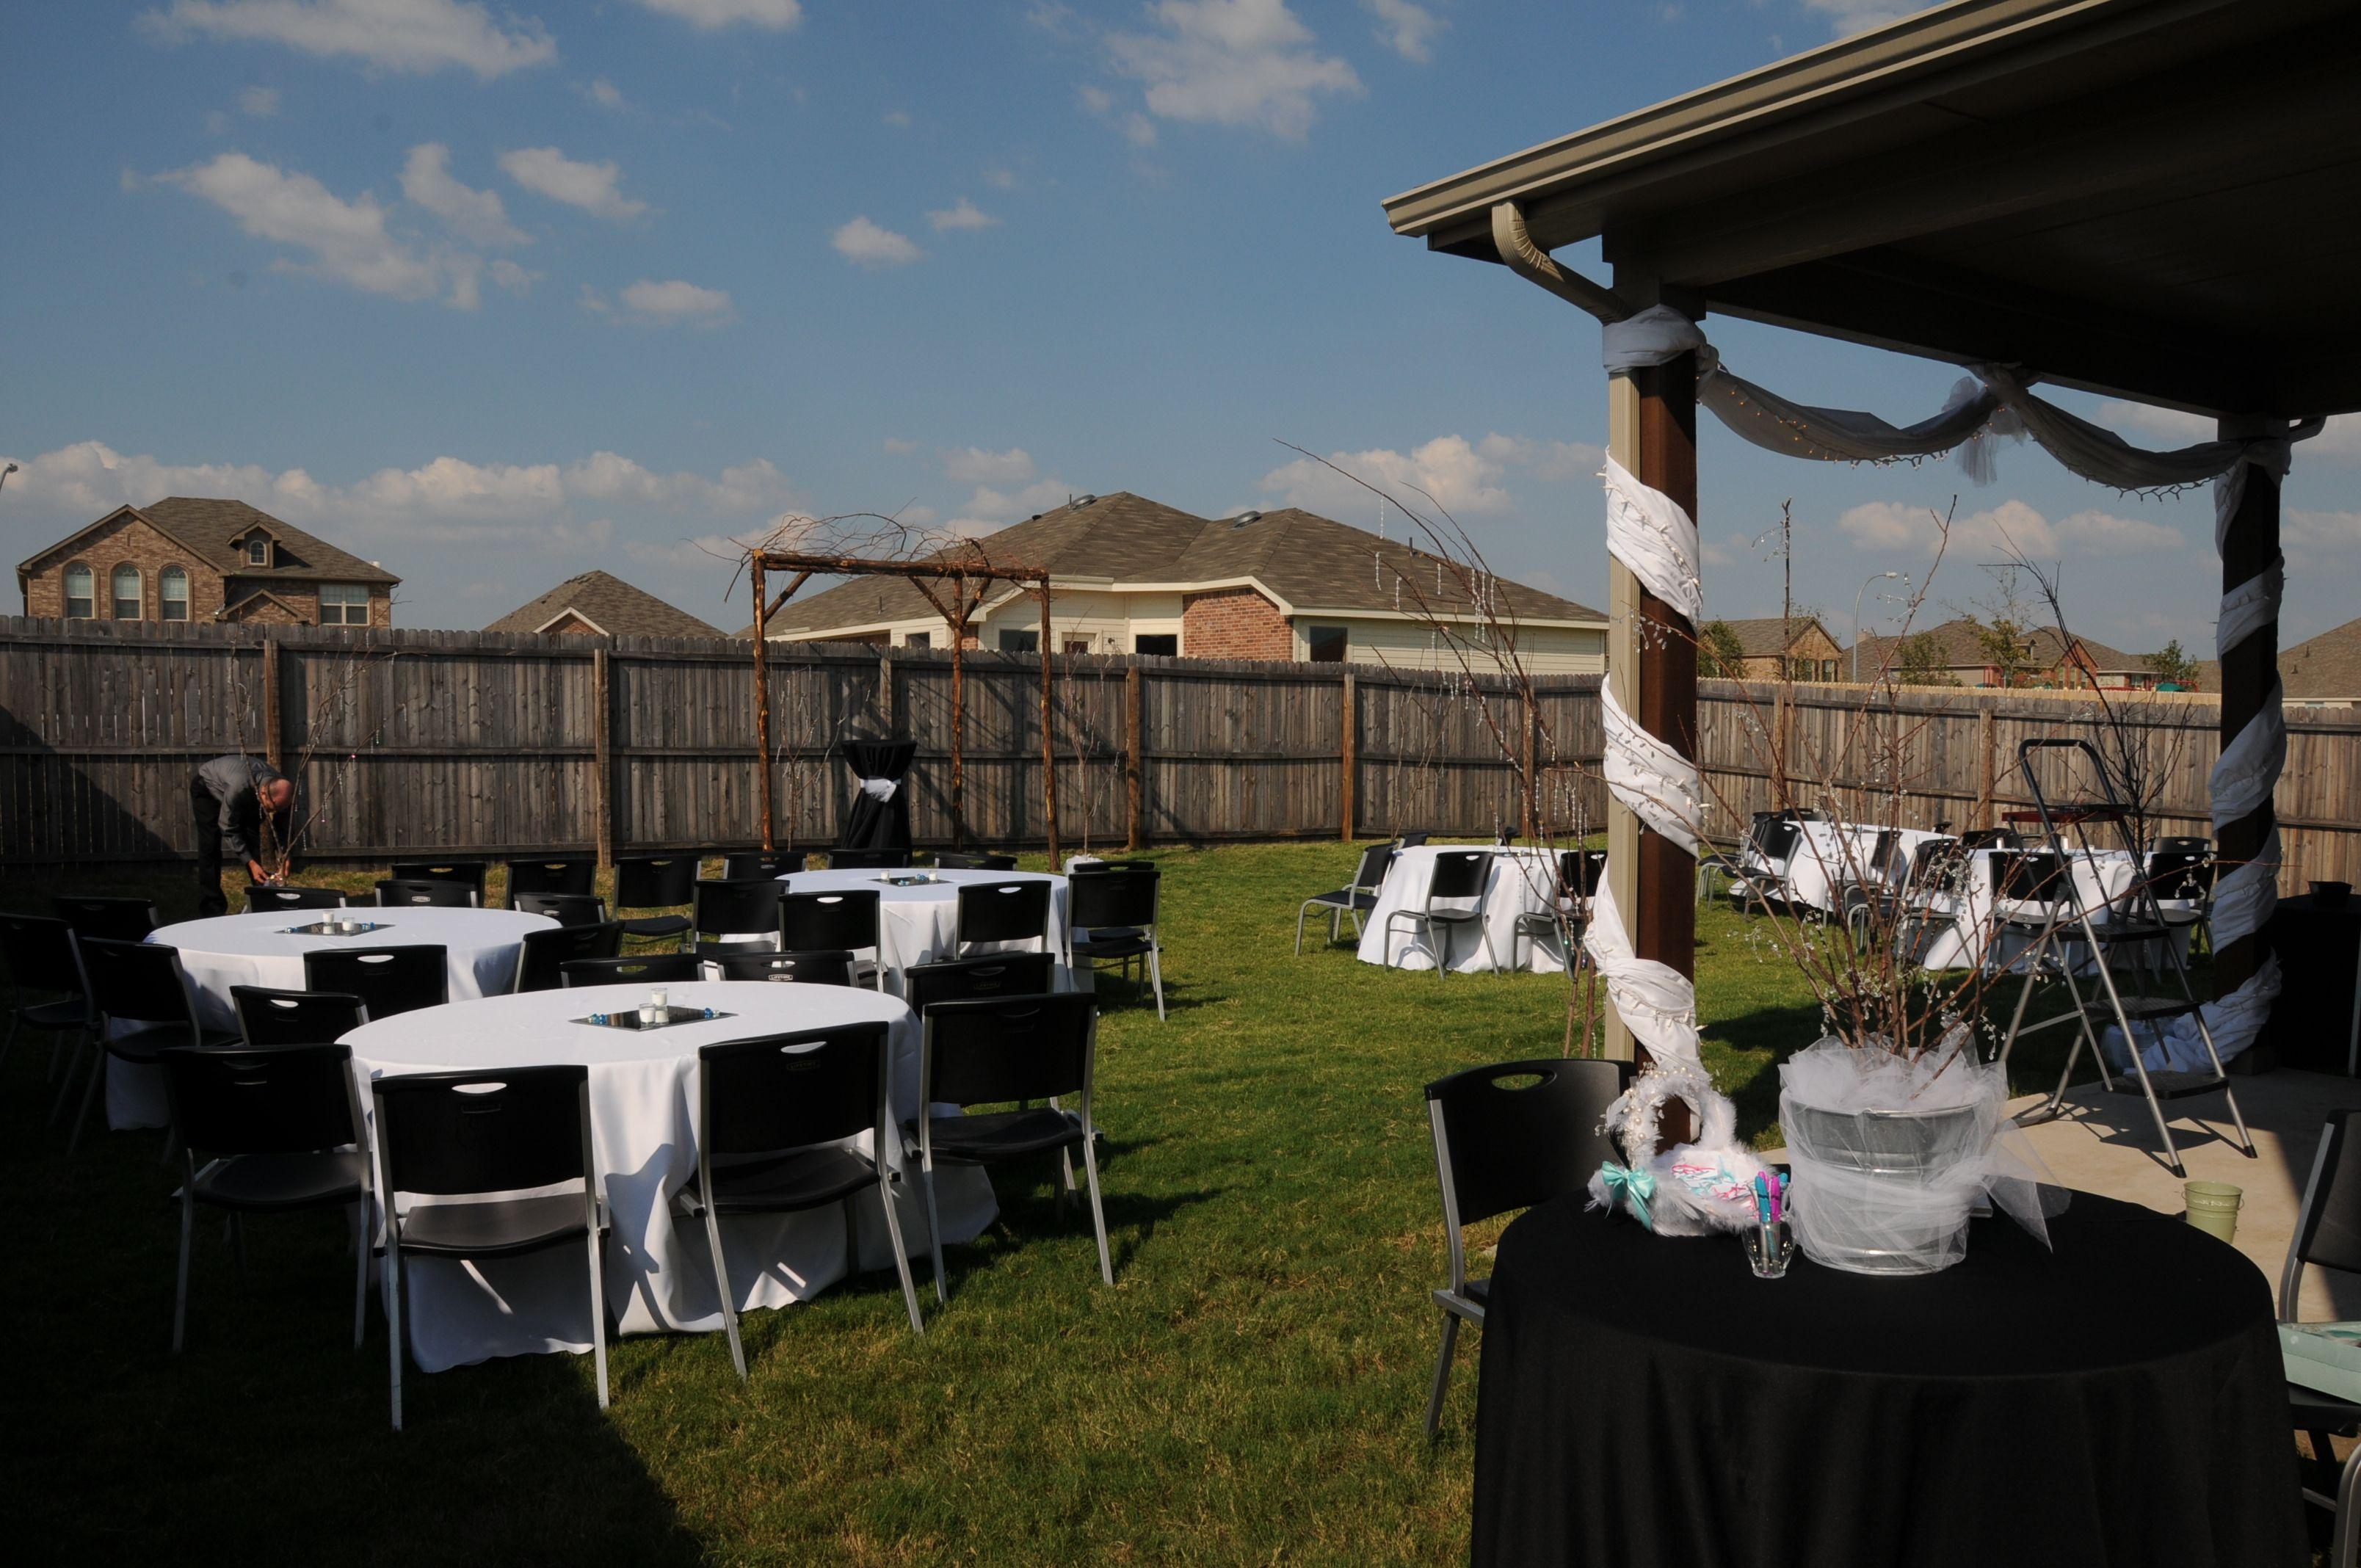 Tiny Backyard Wedding : Small backyard wedding  Wedding Ideas  Pinterest